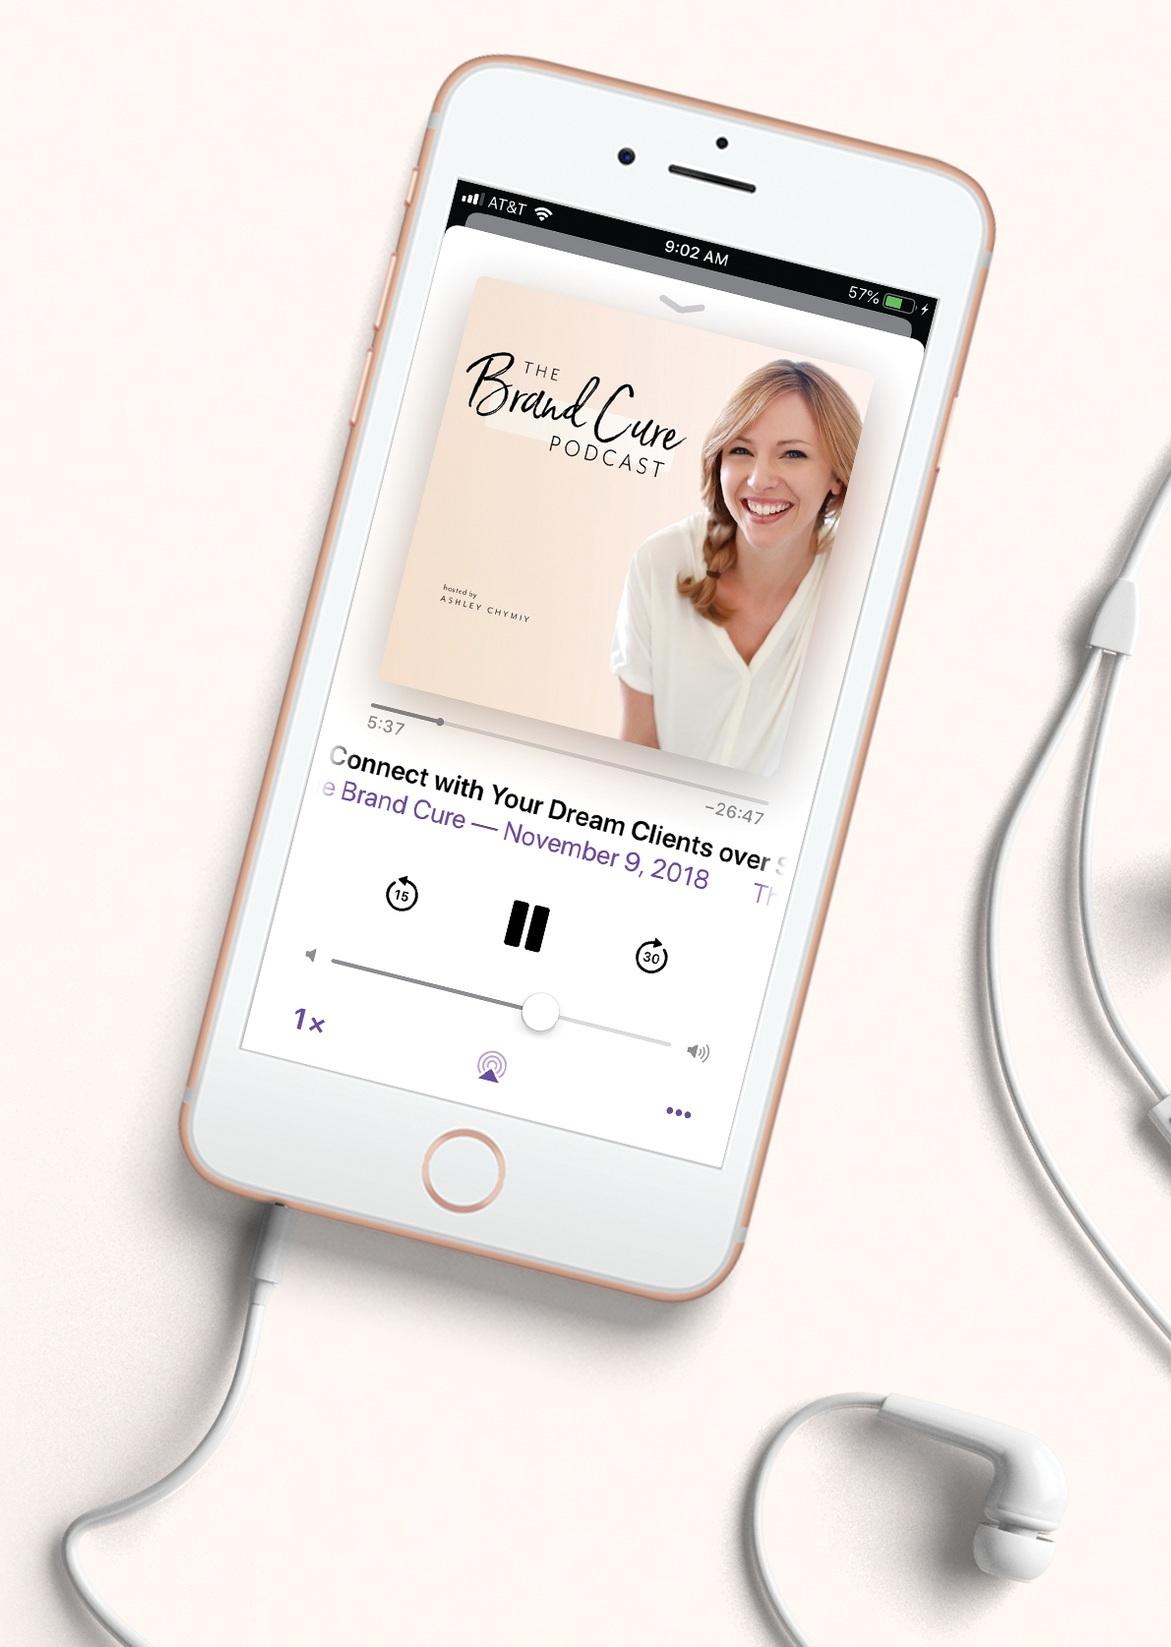 Listen%2Bto%2Bthe%2Bpodcast